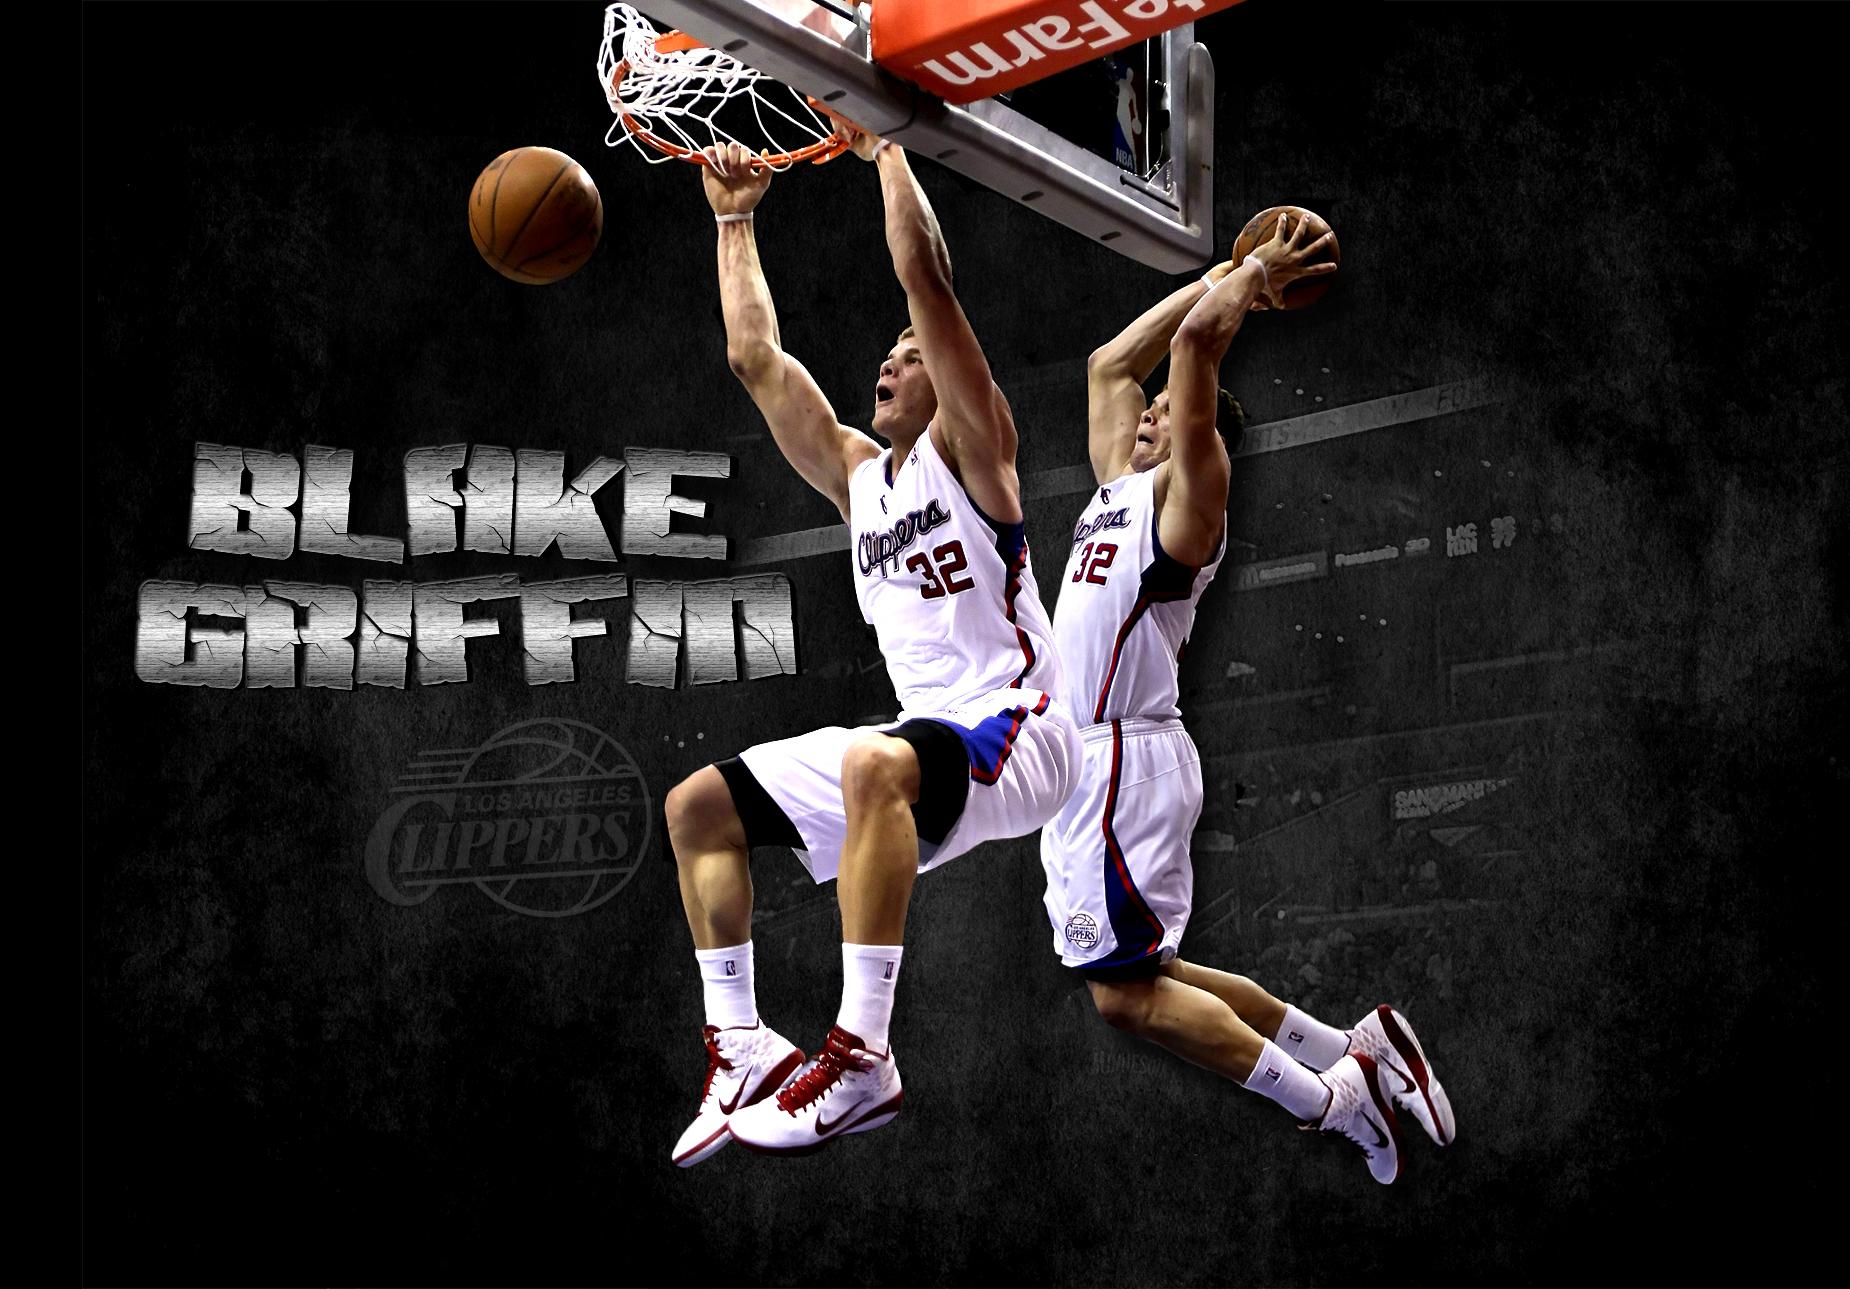 blake griffin wallpaper - photo #17